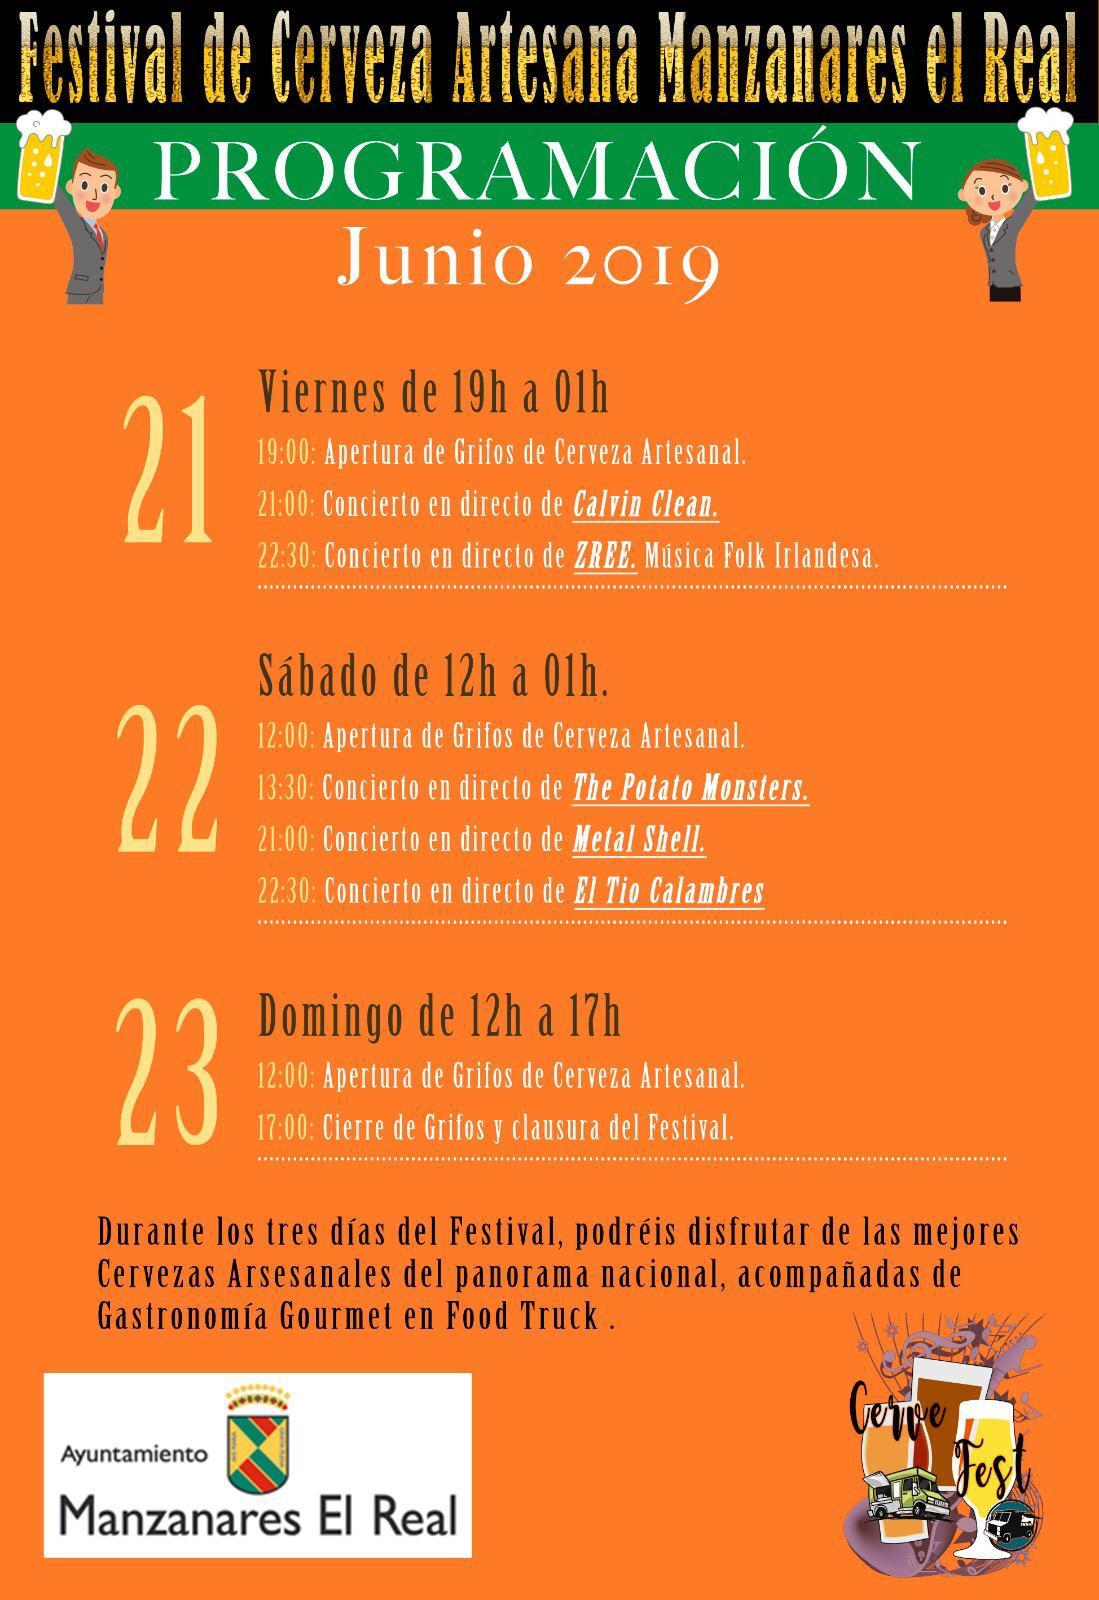 Programa del Festival de la Cerveza artesana de Manzanares El Real 2019